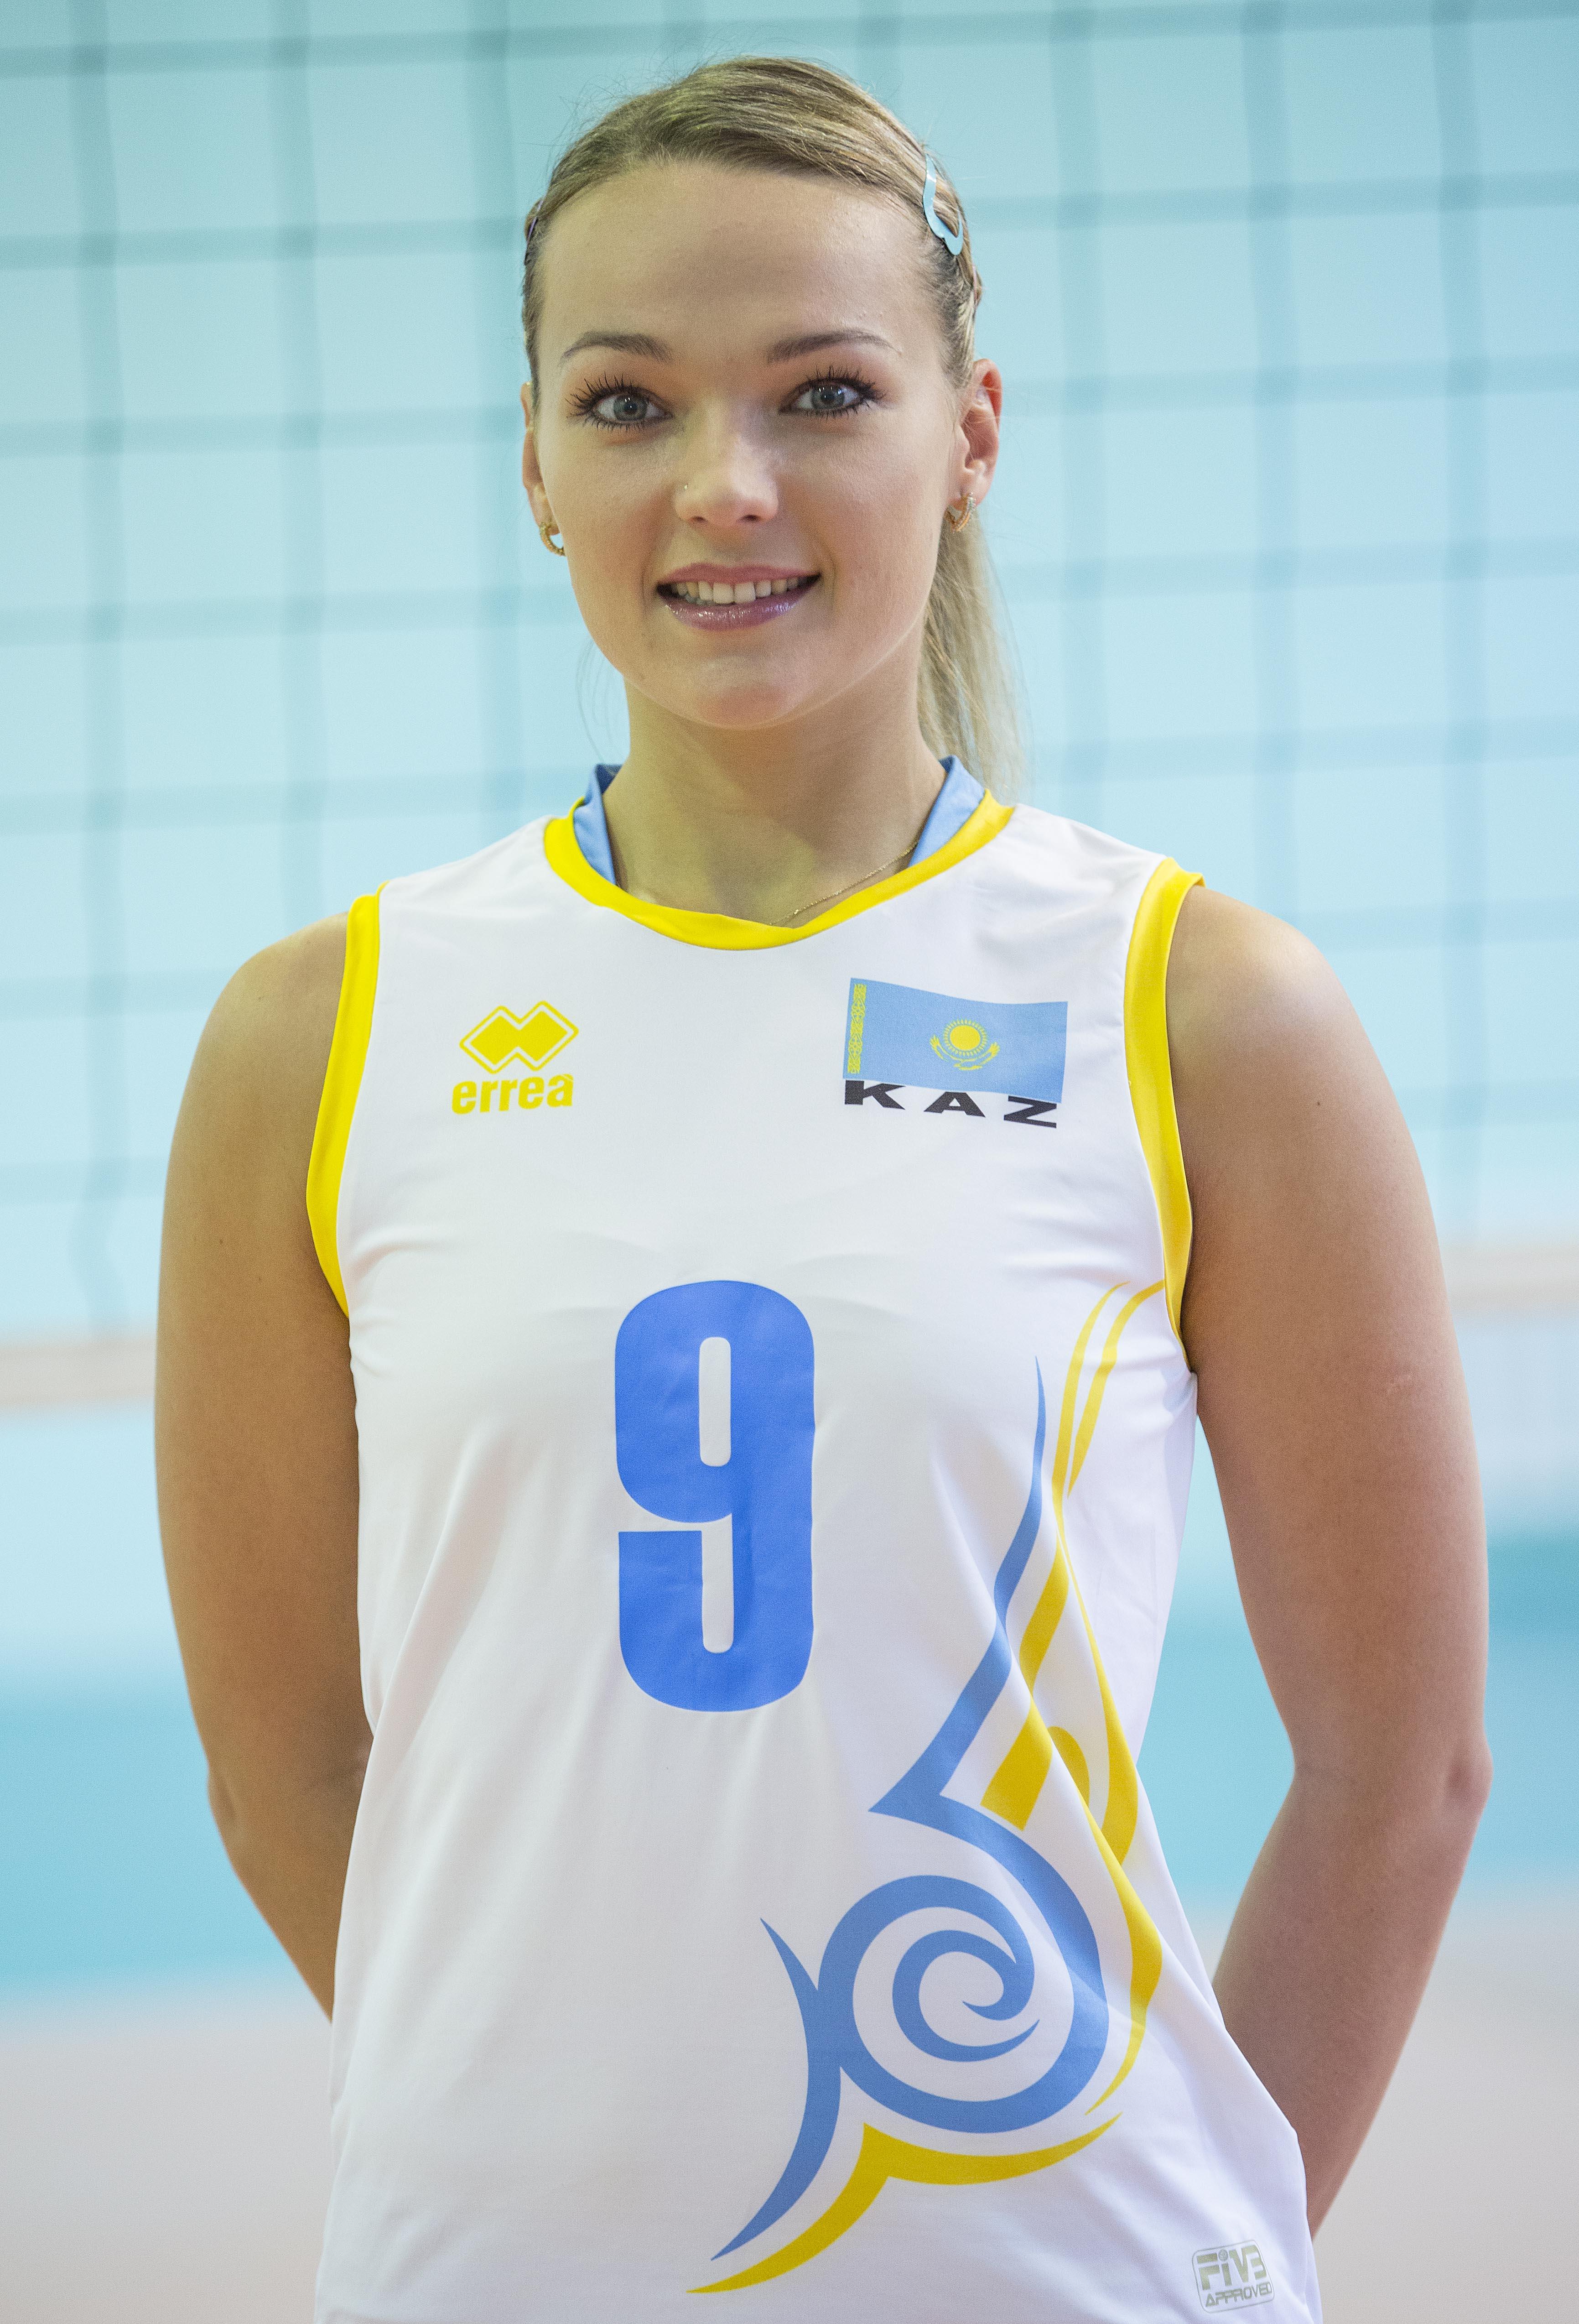 Irina Lukomskaya